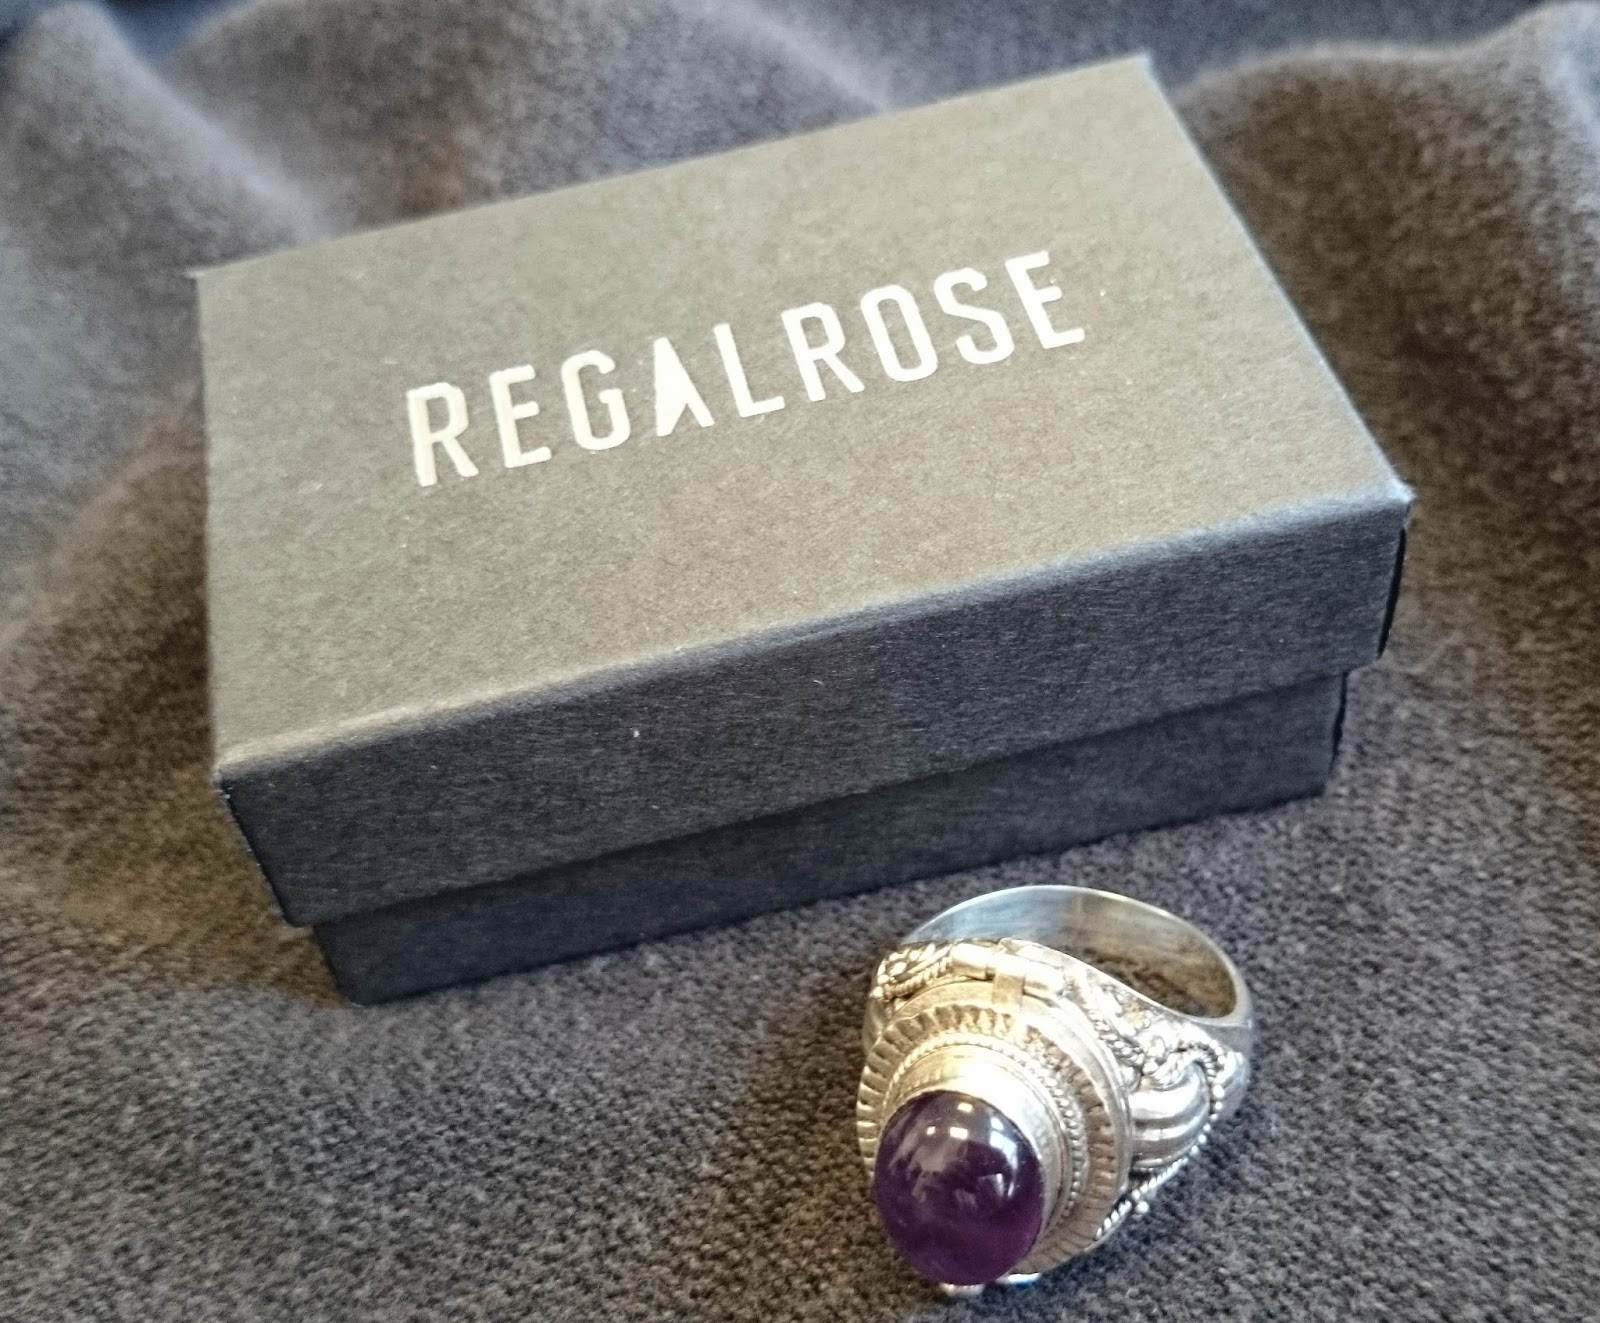 regal rose saros silver poison trinket ring amethyst gothic jewellery